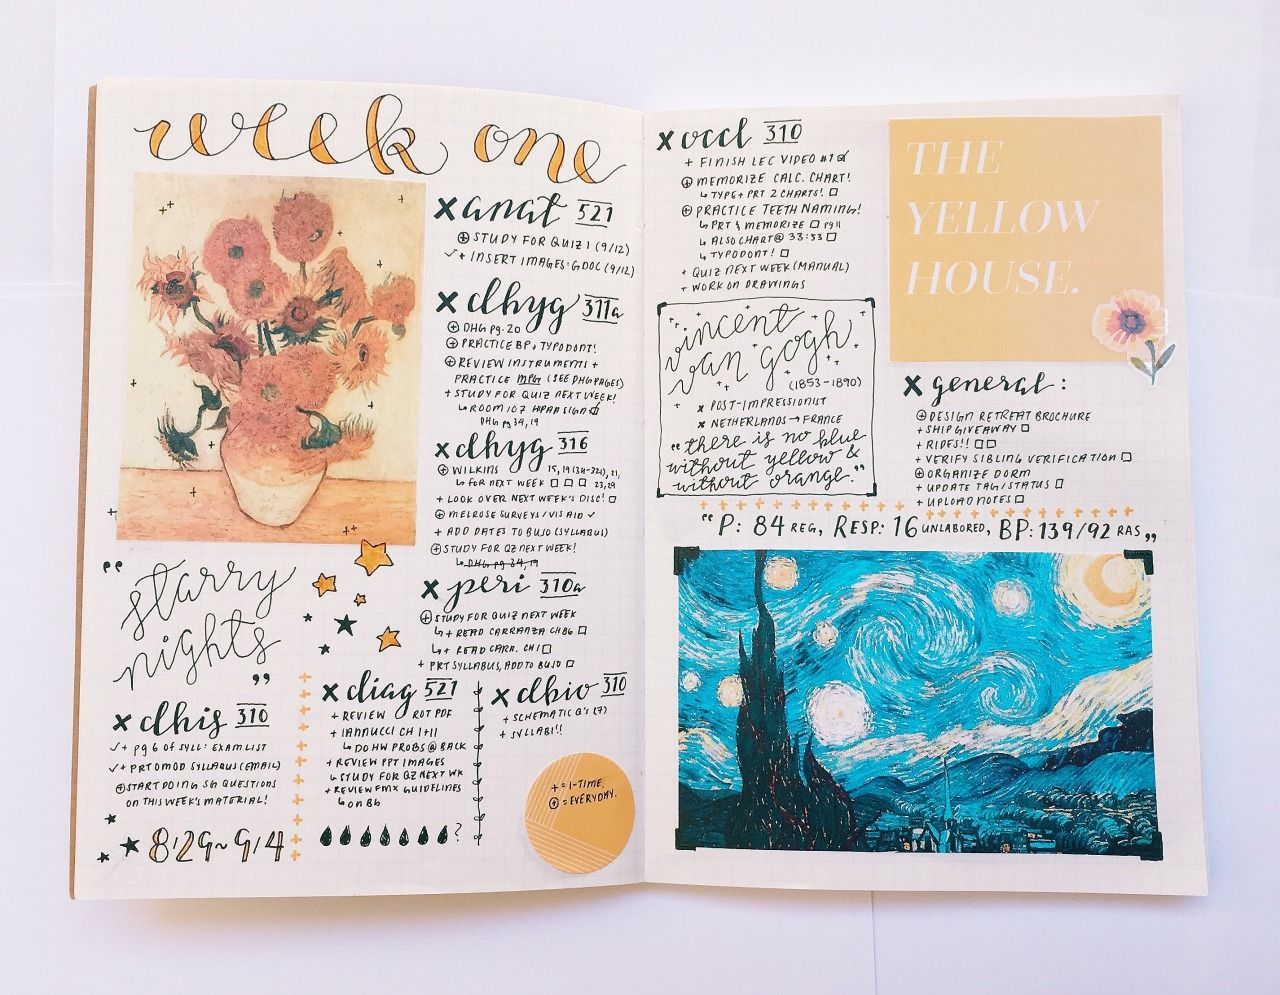 42 100 Days Of Productivity Sat 9 3 16 11 32am Theme Of The Week Vincent Van Gogh September Artist Bullet Journal Inspiration Journal Bullet Journal